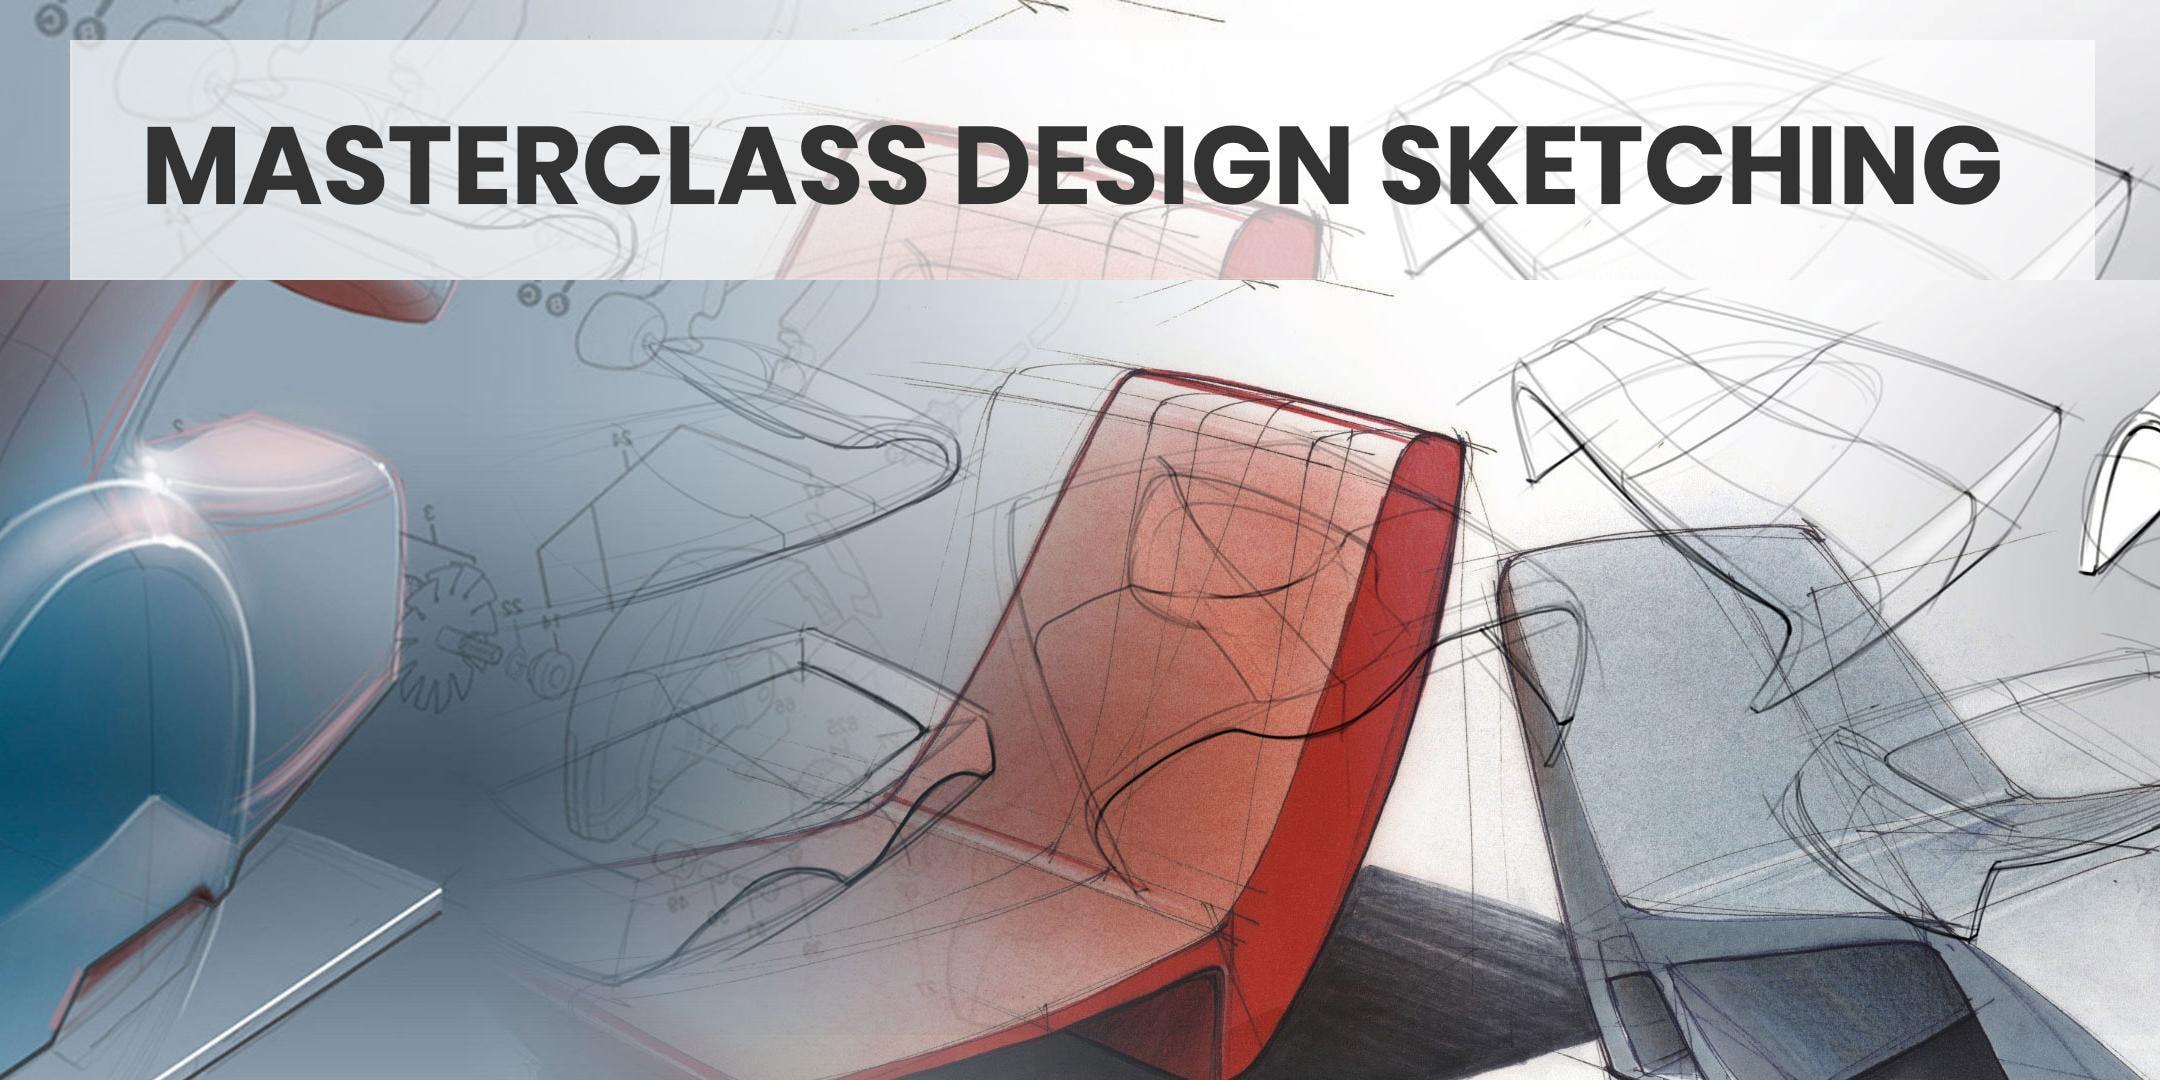 Masterclass Design Sketching